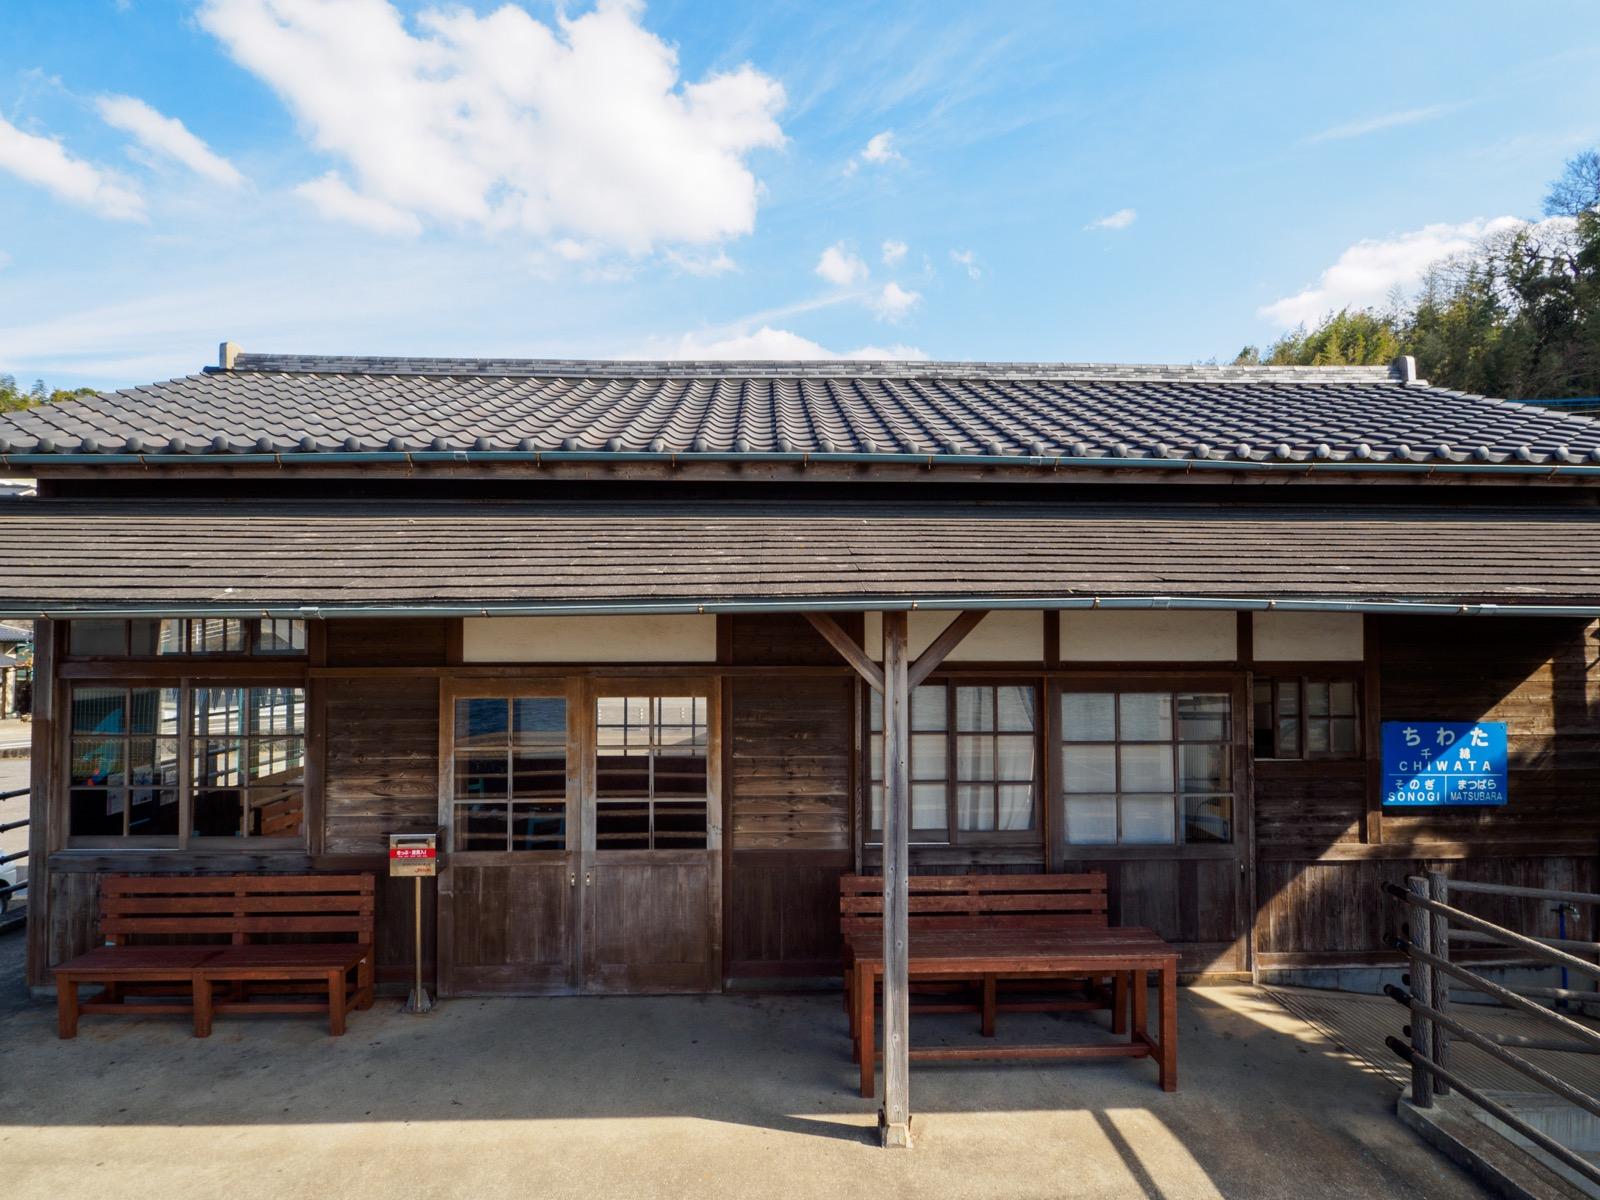 千綿駅の駅舎